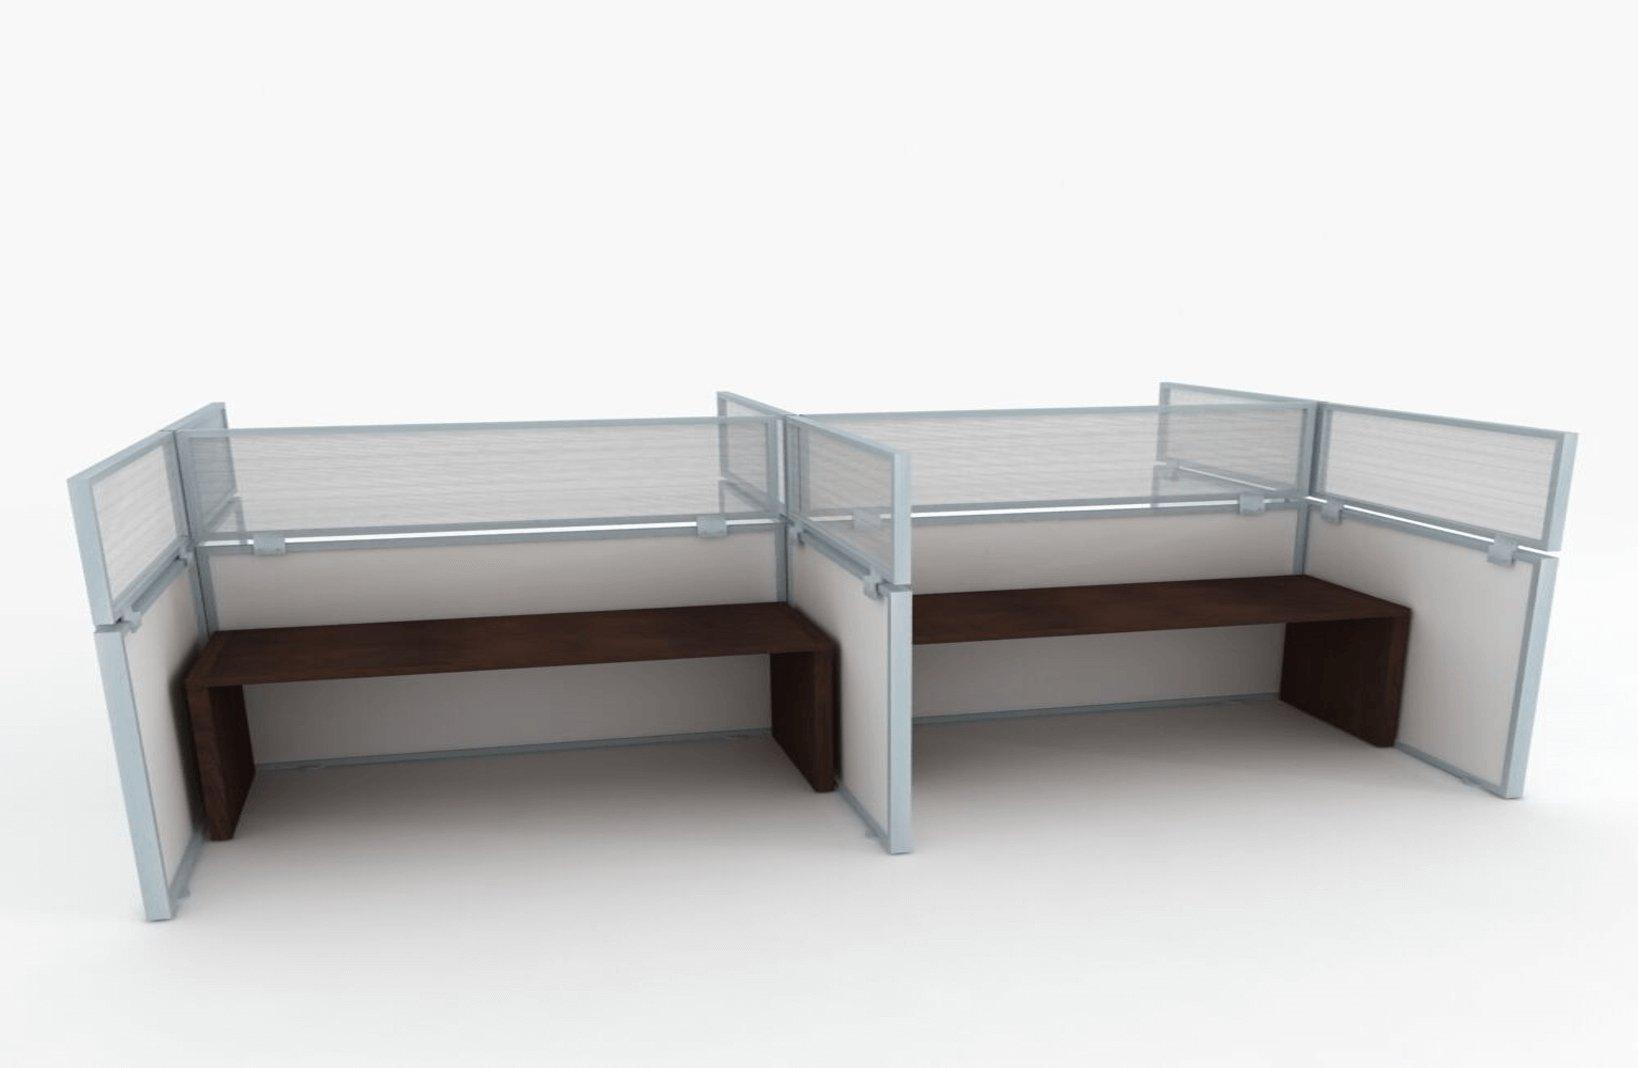 Desk Dividers - Border Cubicle Dividers 12H